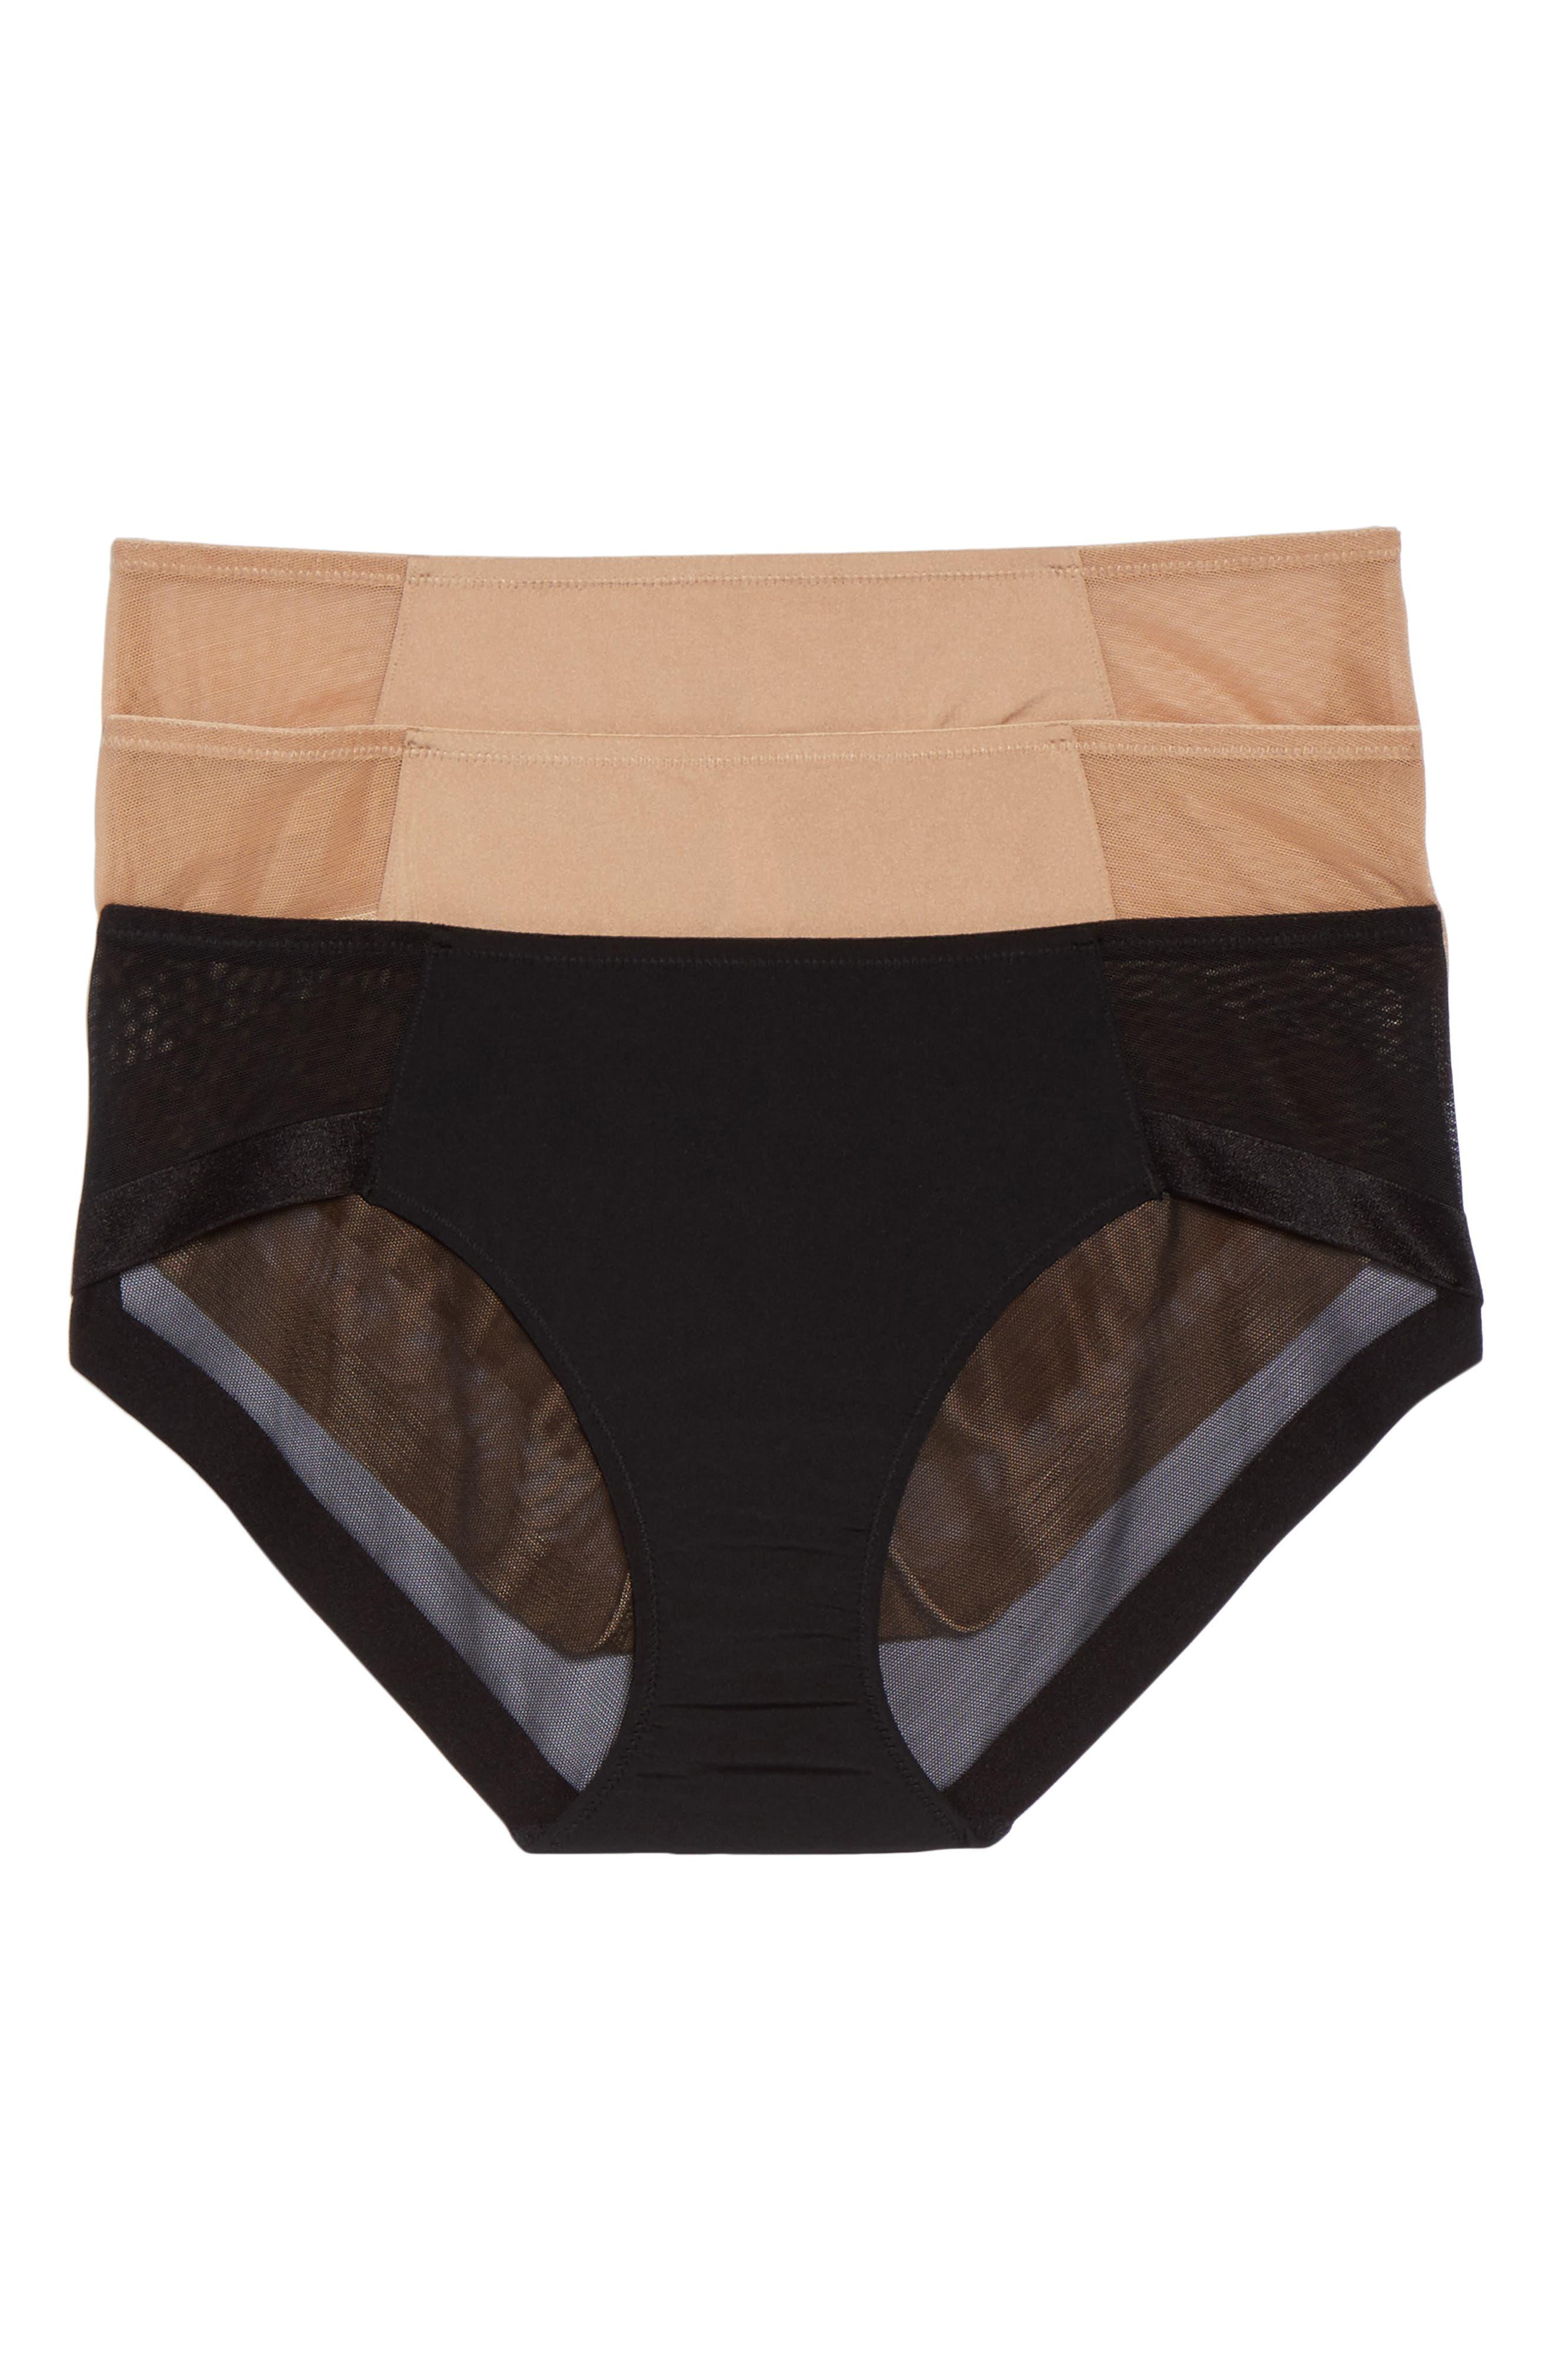 Infinite Edge 3-Pack Bikini,                         Main,                         color, 250